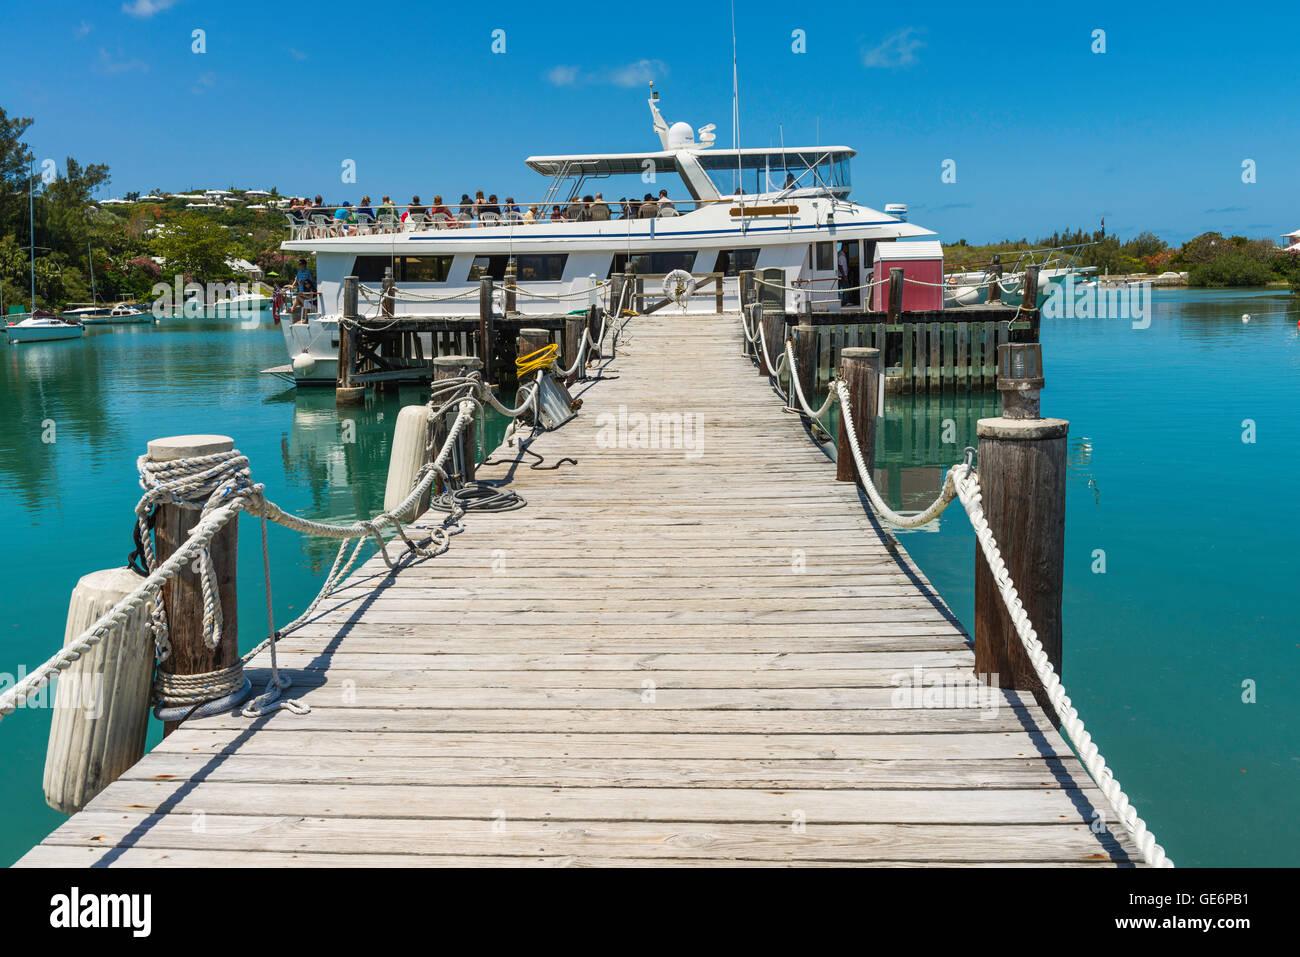 Ferry to Hamilton waits at the Waterlot  Inn dock, Fairmont Southampton Resort, Jew's Bay, Southampton Parish, - Stock Image